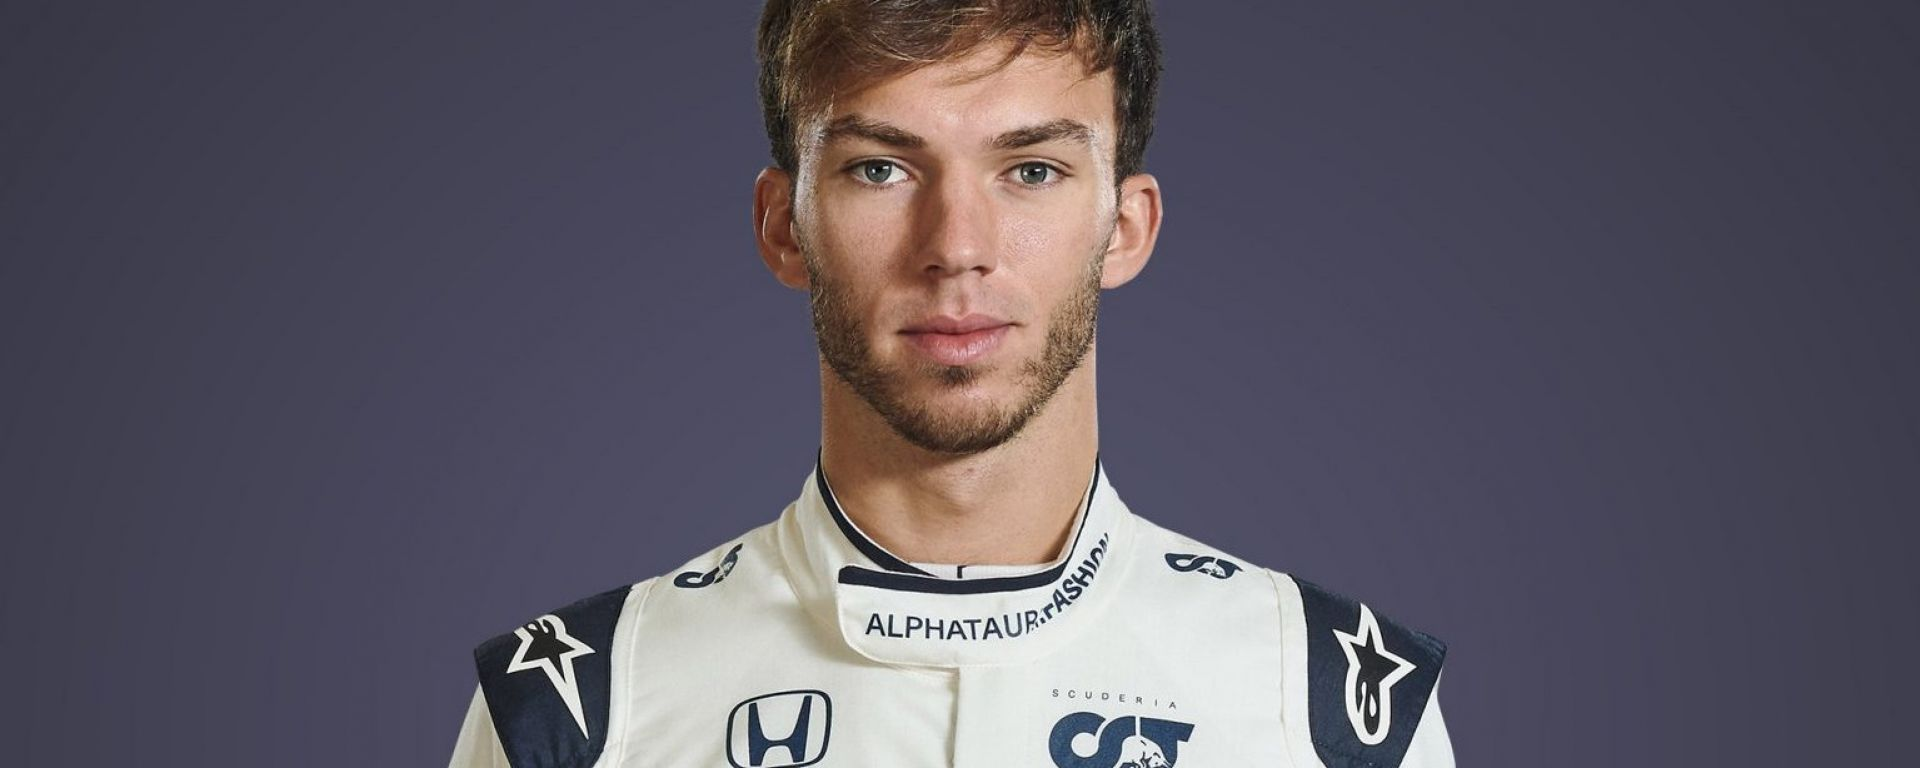 F1 2021: Pierre Gasly (Scuderia AlphaTauri)